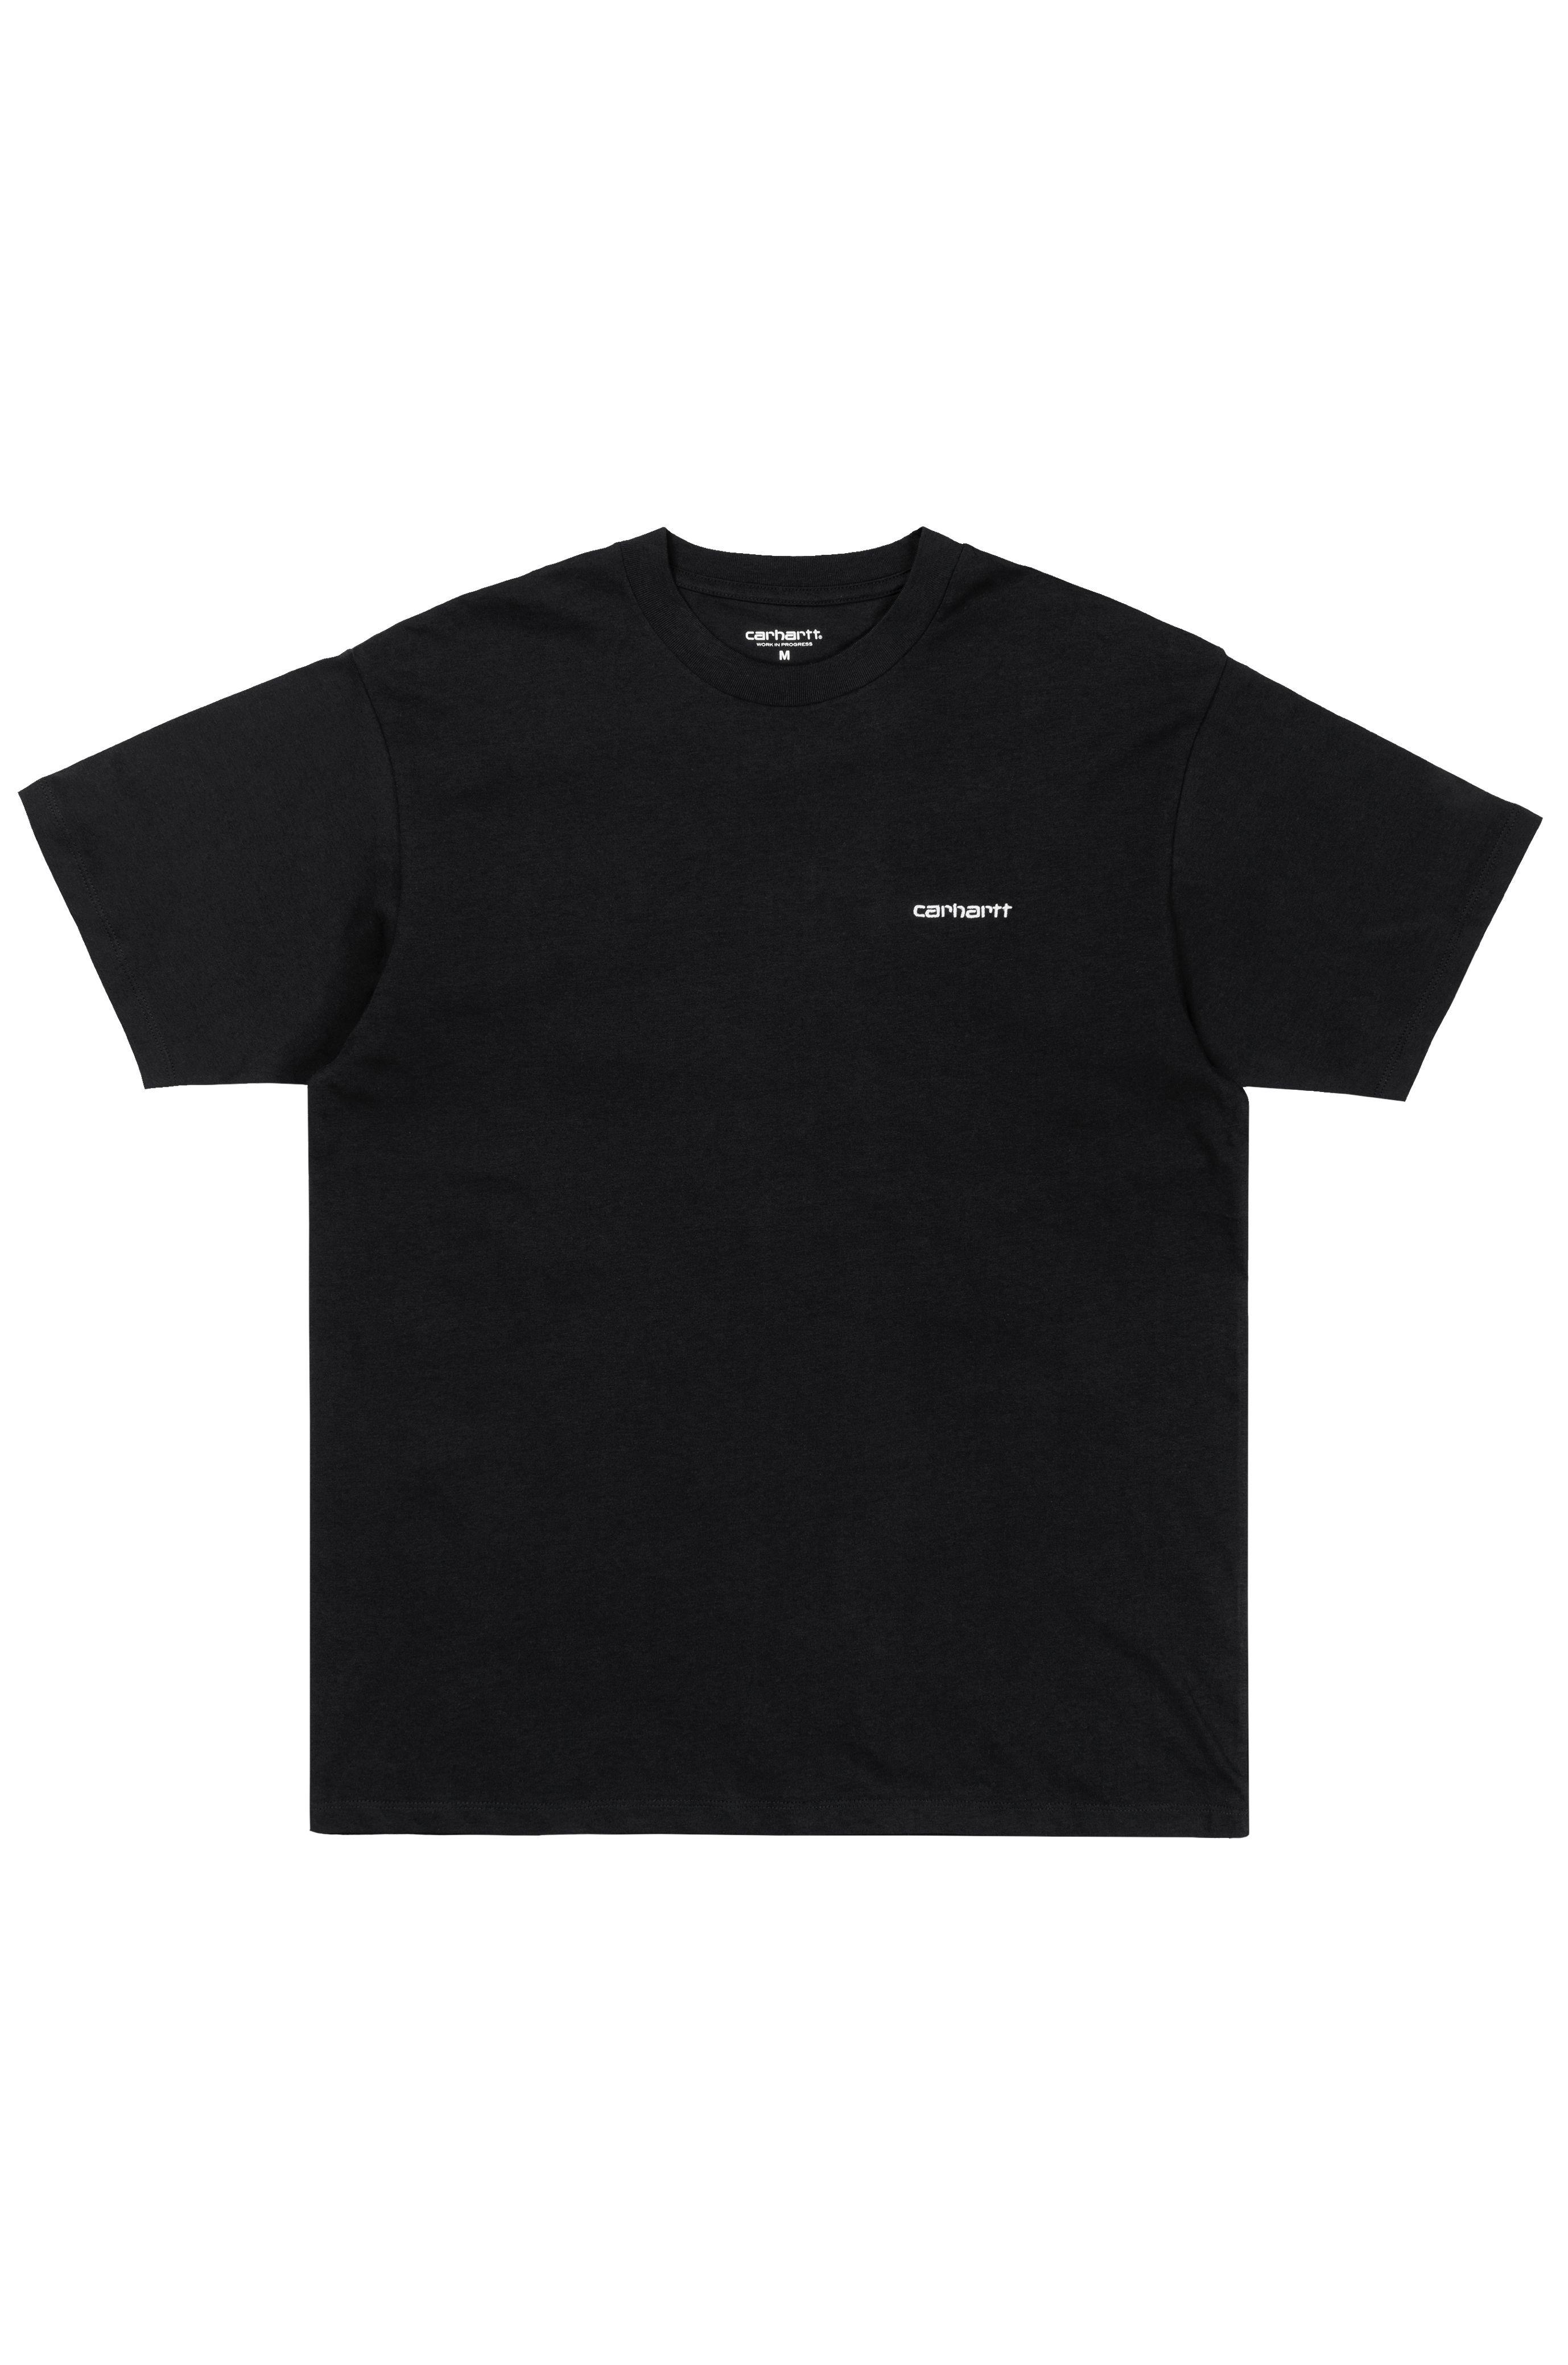 Carhartt WIP T-Shirt SCRIPT EMBROIDERY Black/White